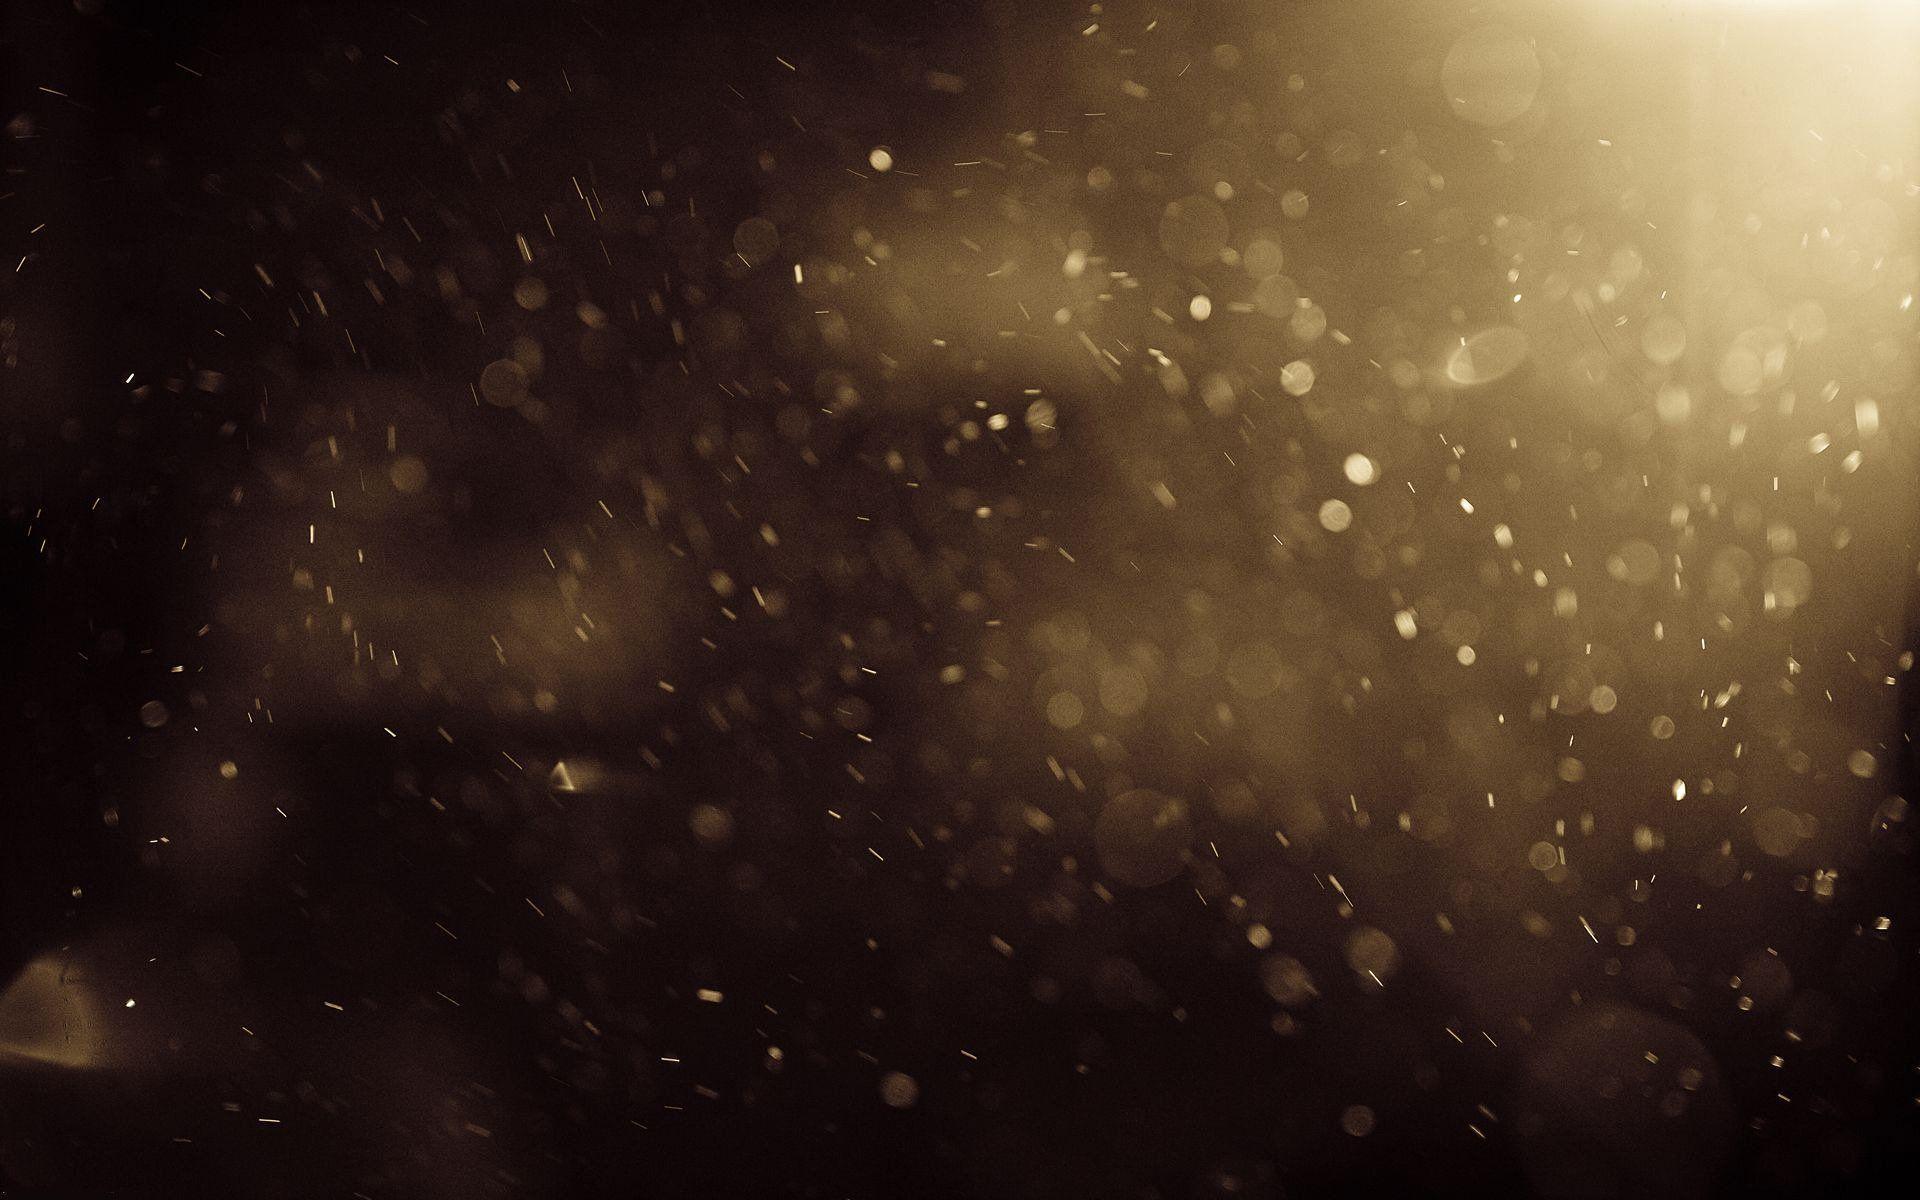 Dust Particles Wallpaper 730710 - WallDevil